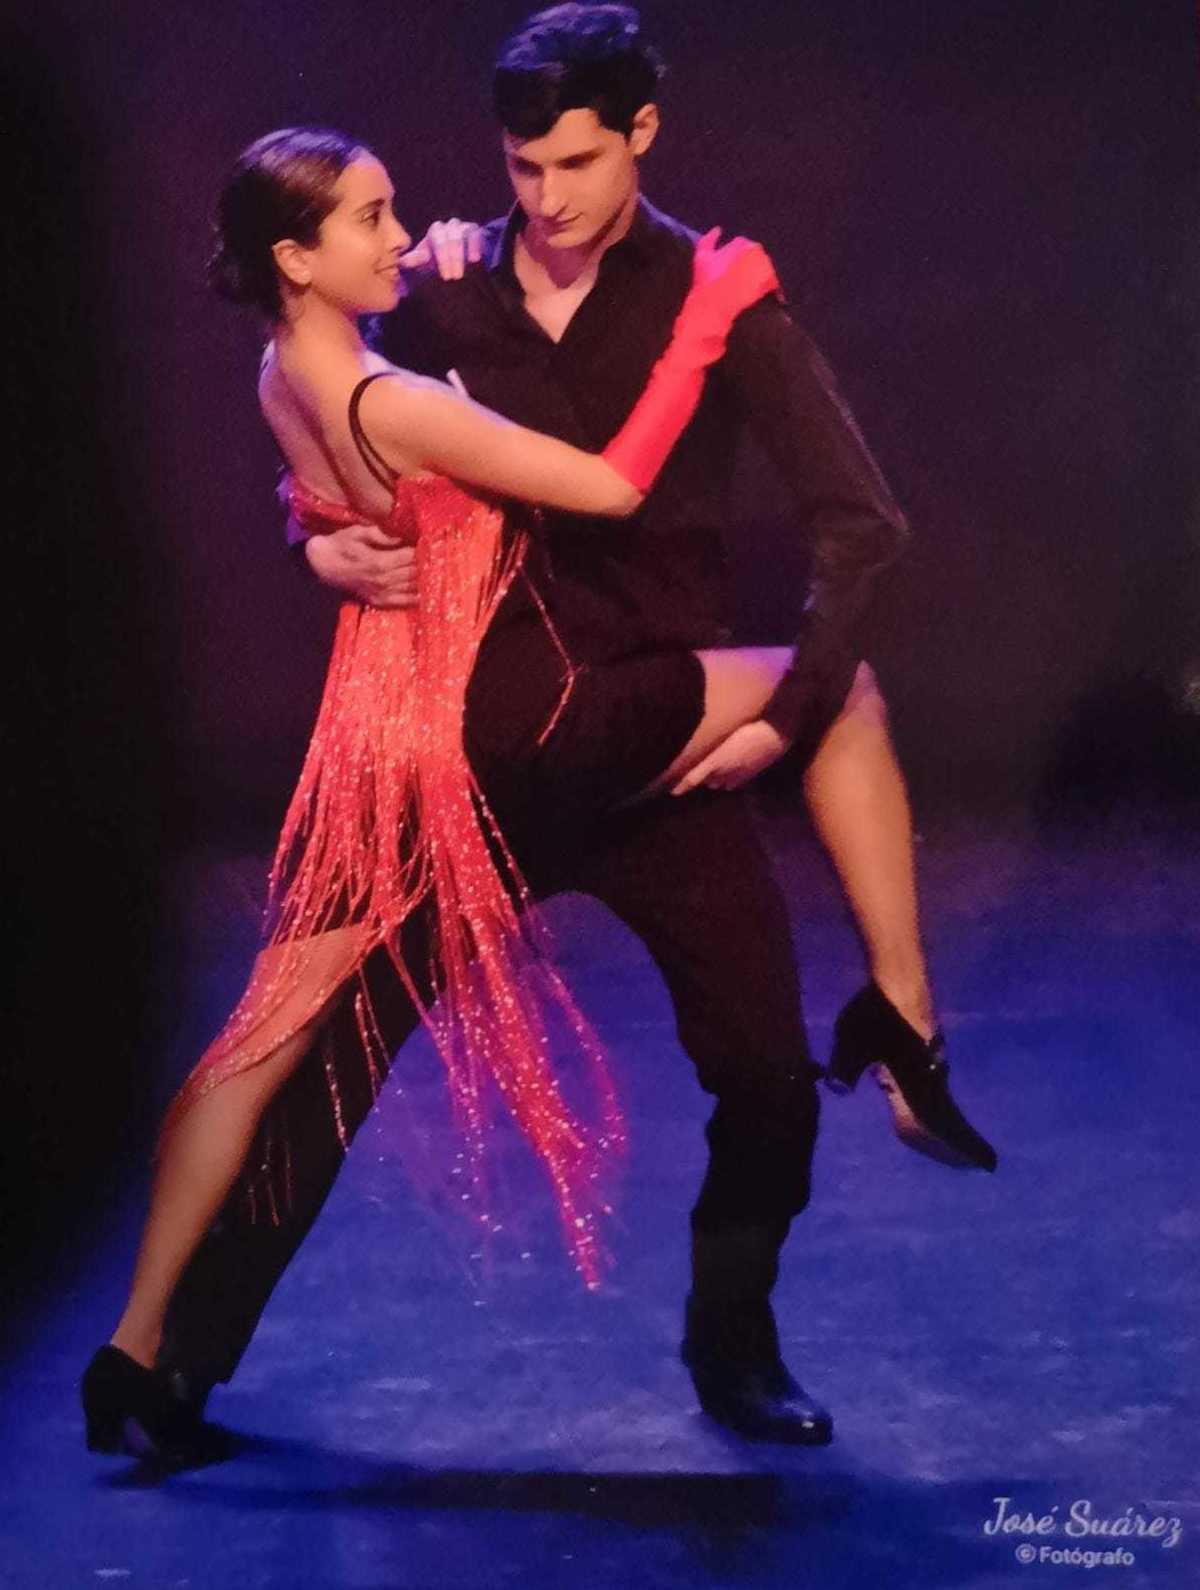 Foto 20 de Academia de danza en  | Academia de Danza Sonia